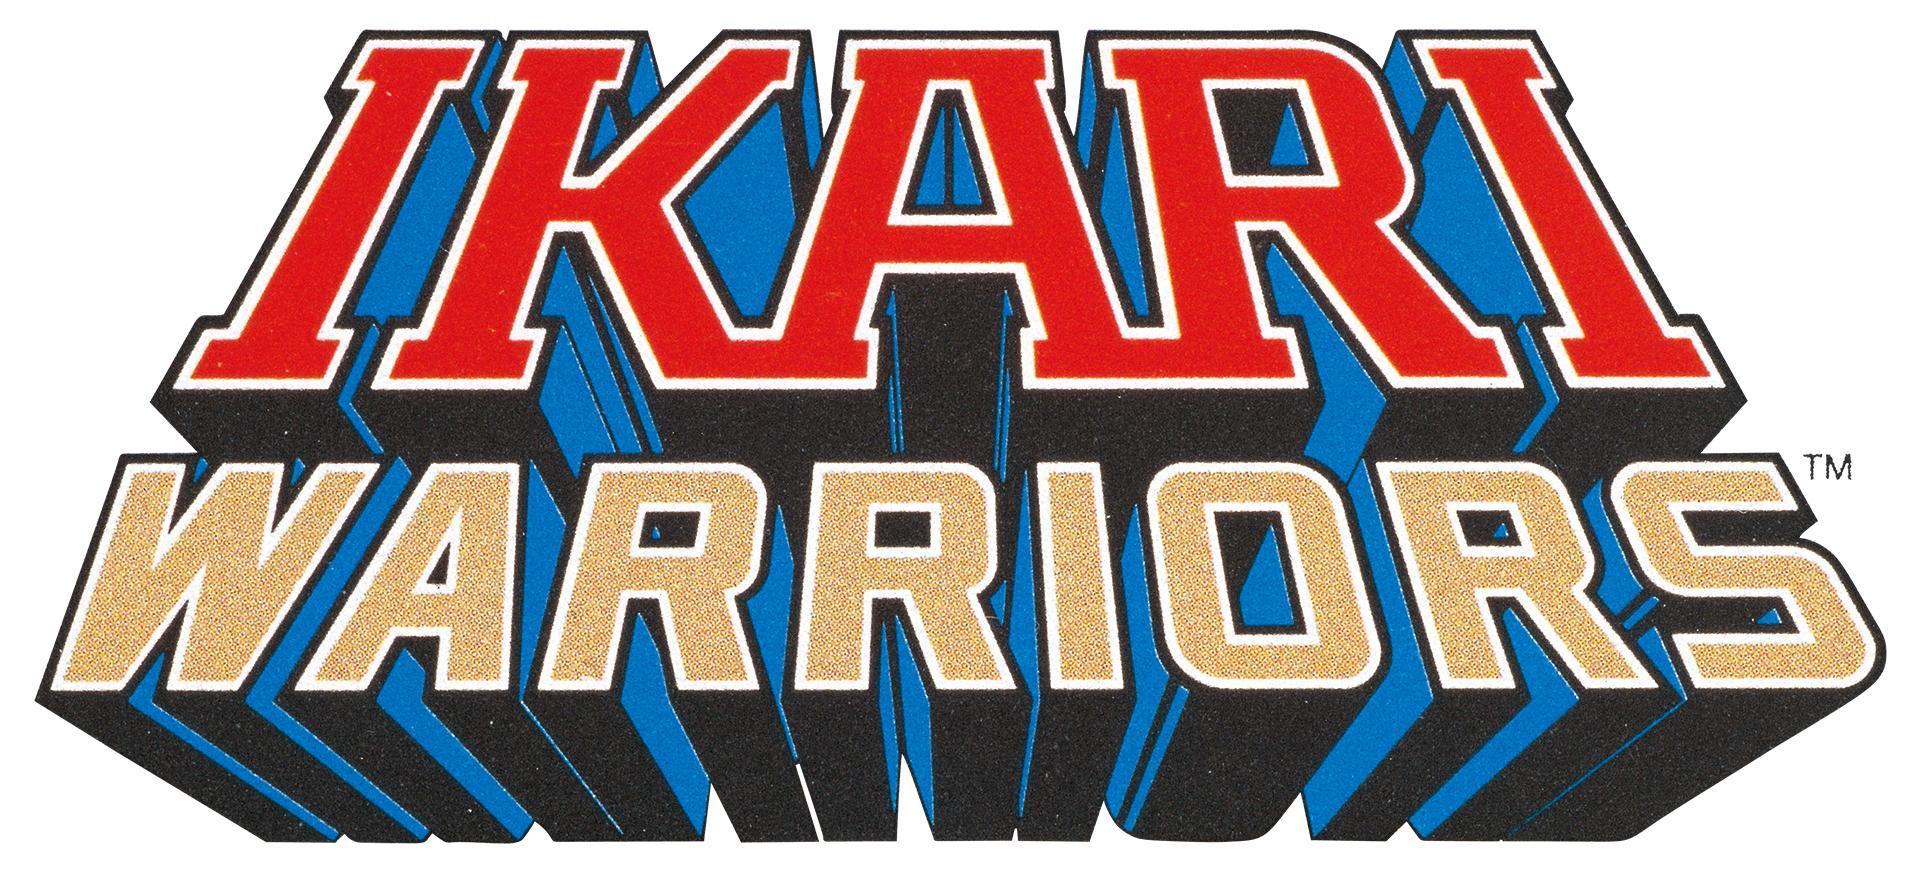 Ikari Warriors (universe)